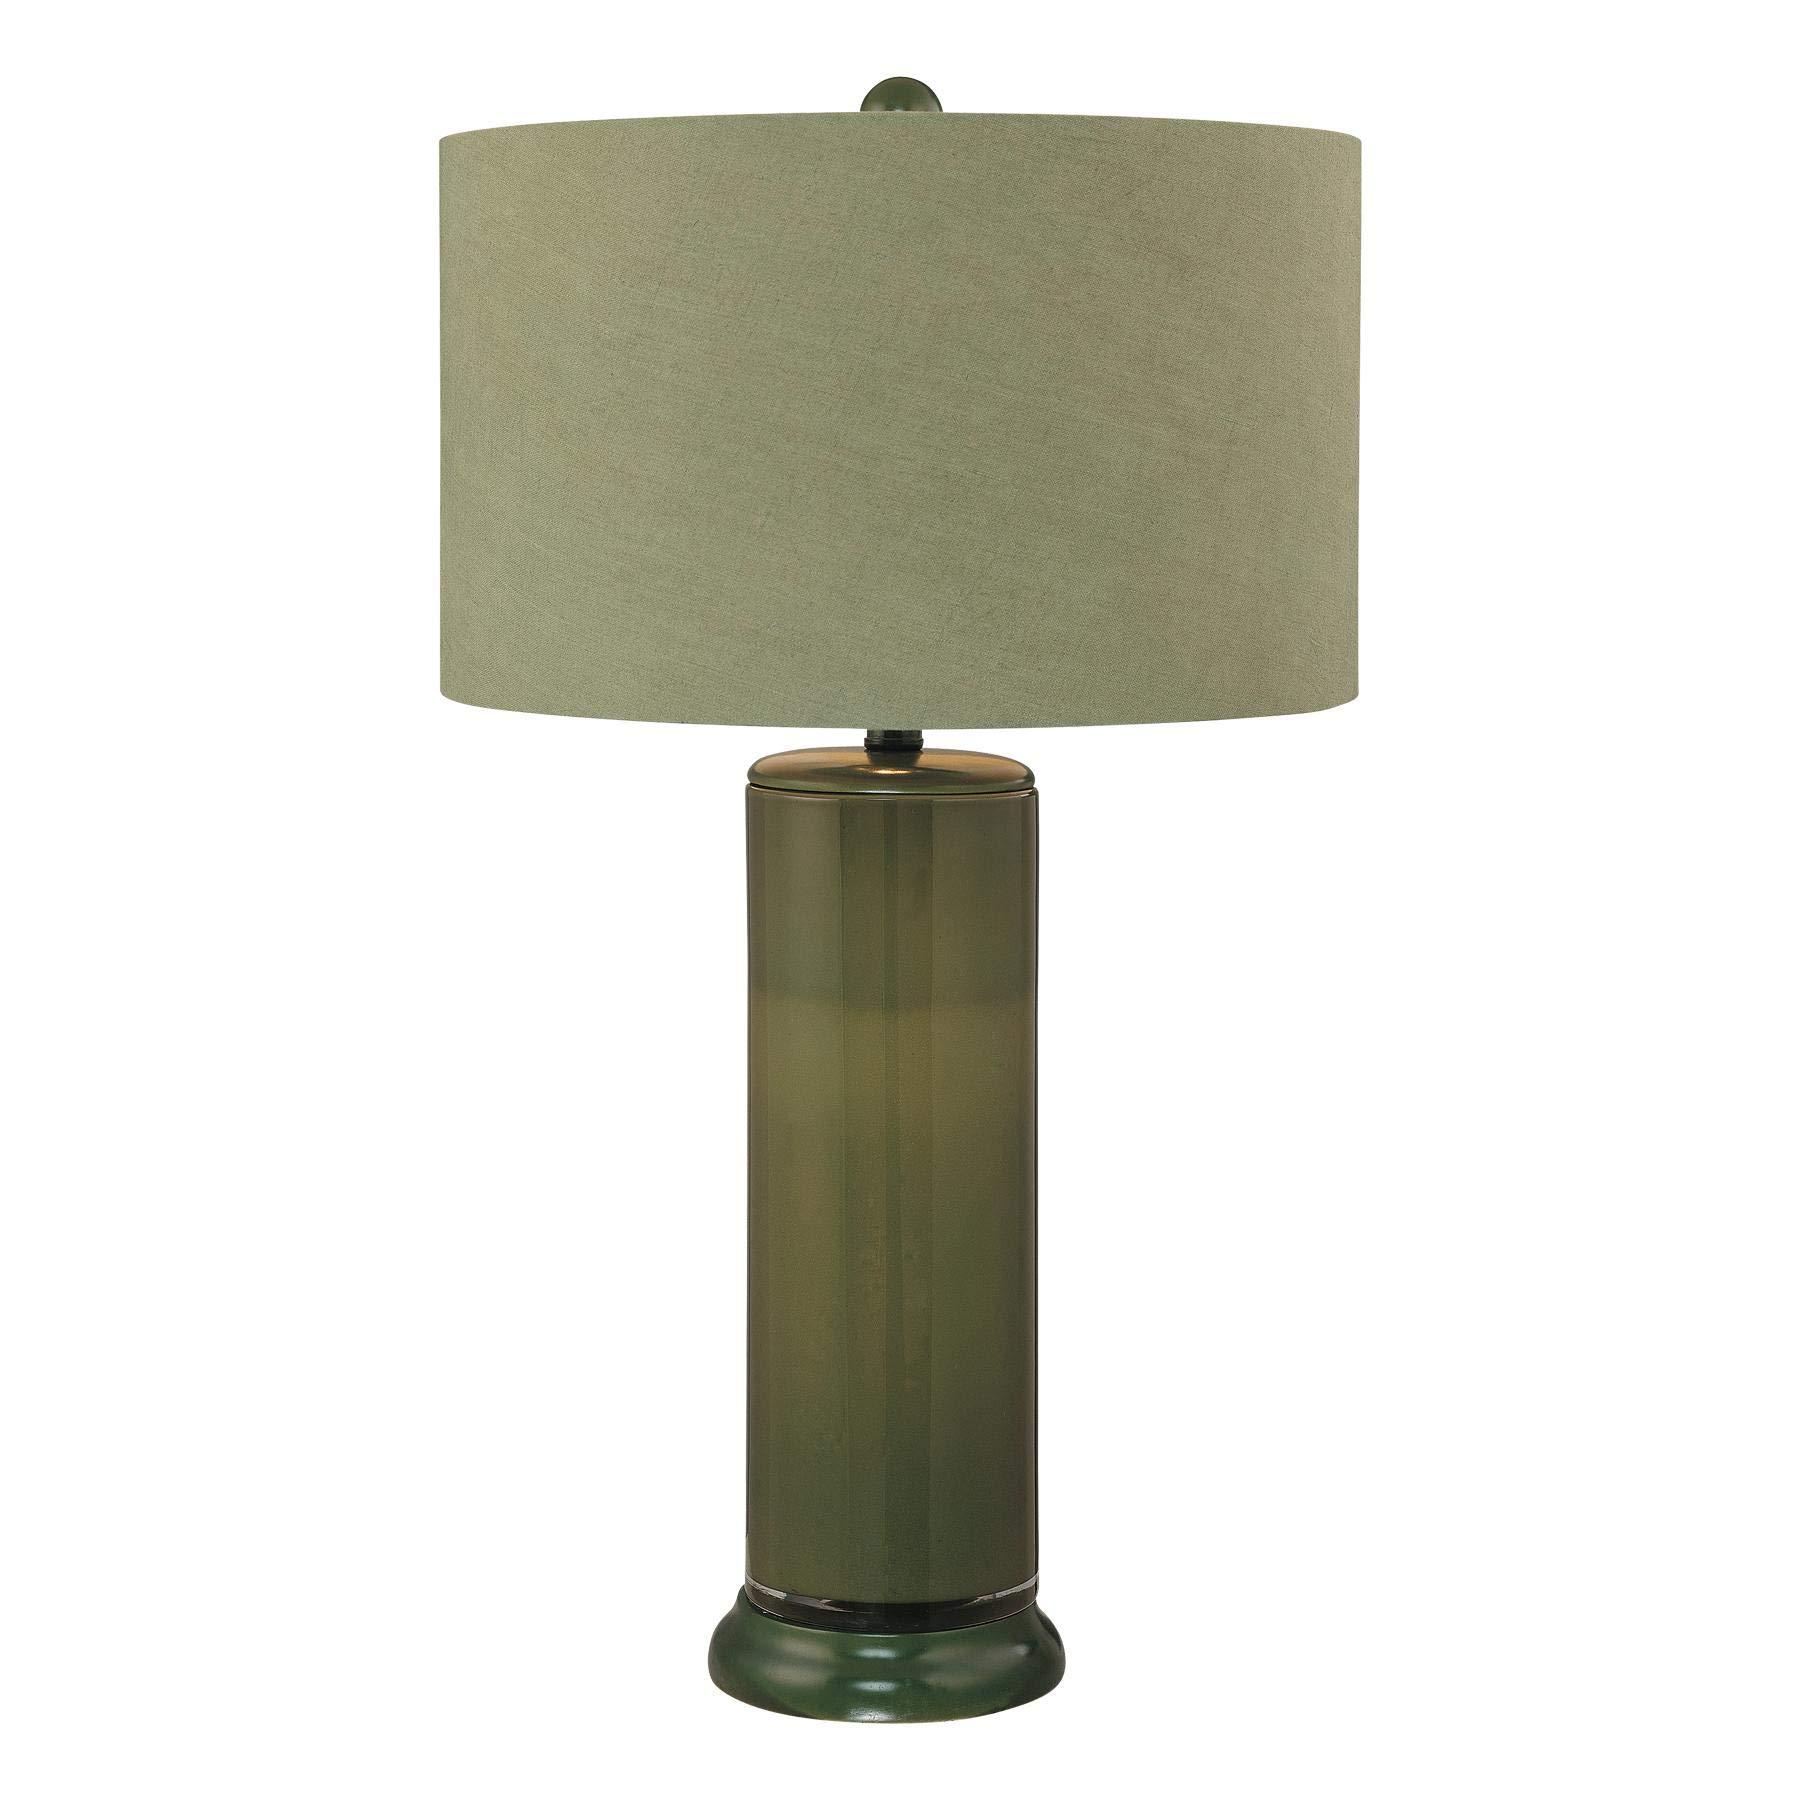 Minka Lavery 10865-1 Ambience Table Lamp, 1-Light 150 Watts, Green